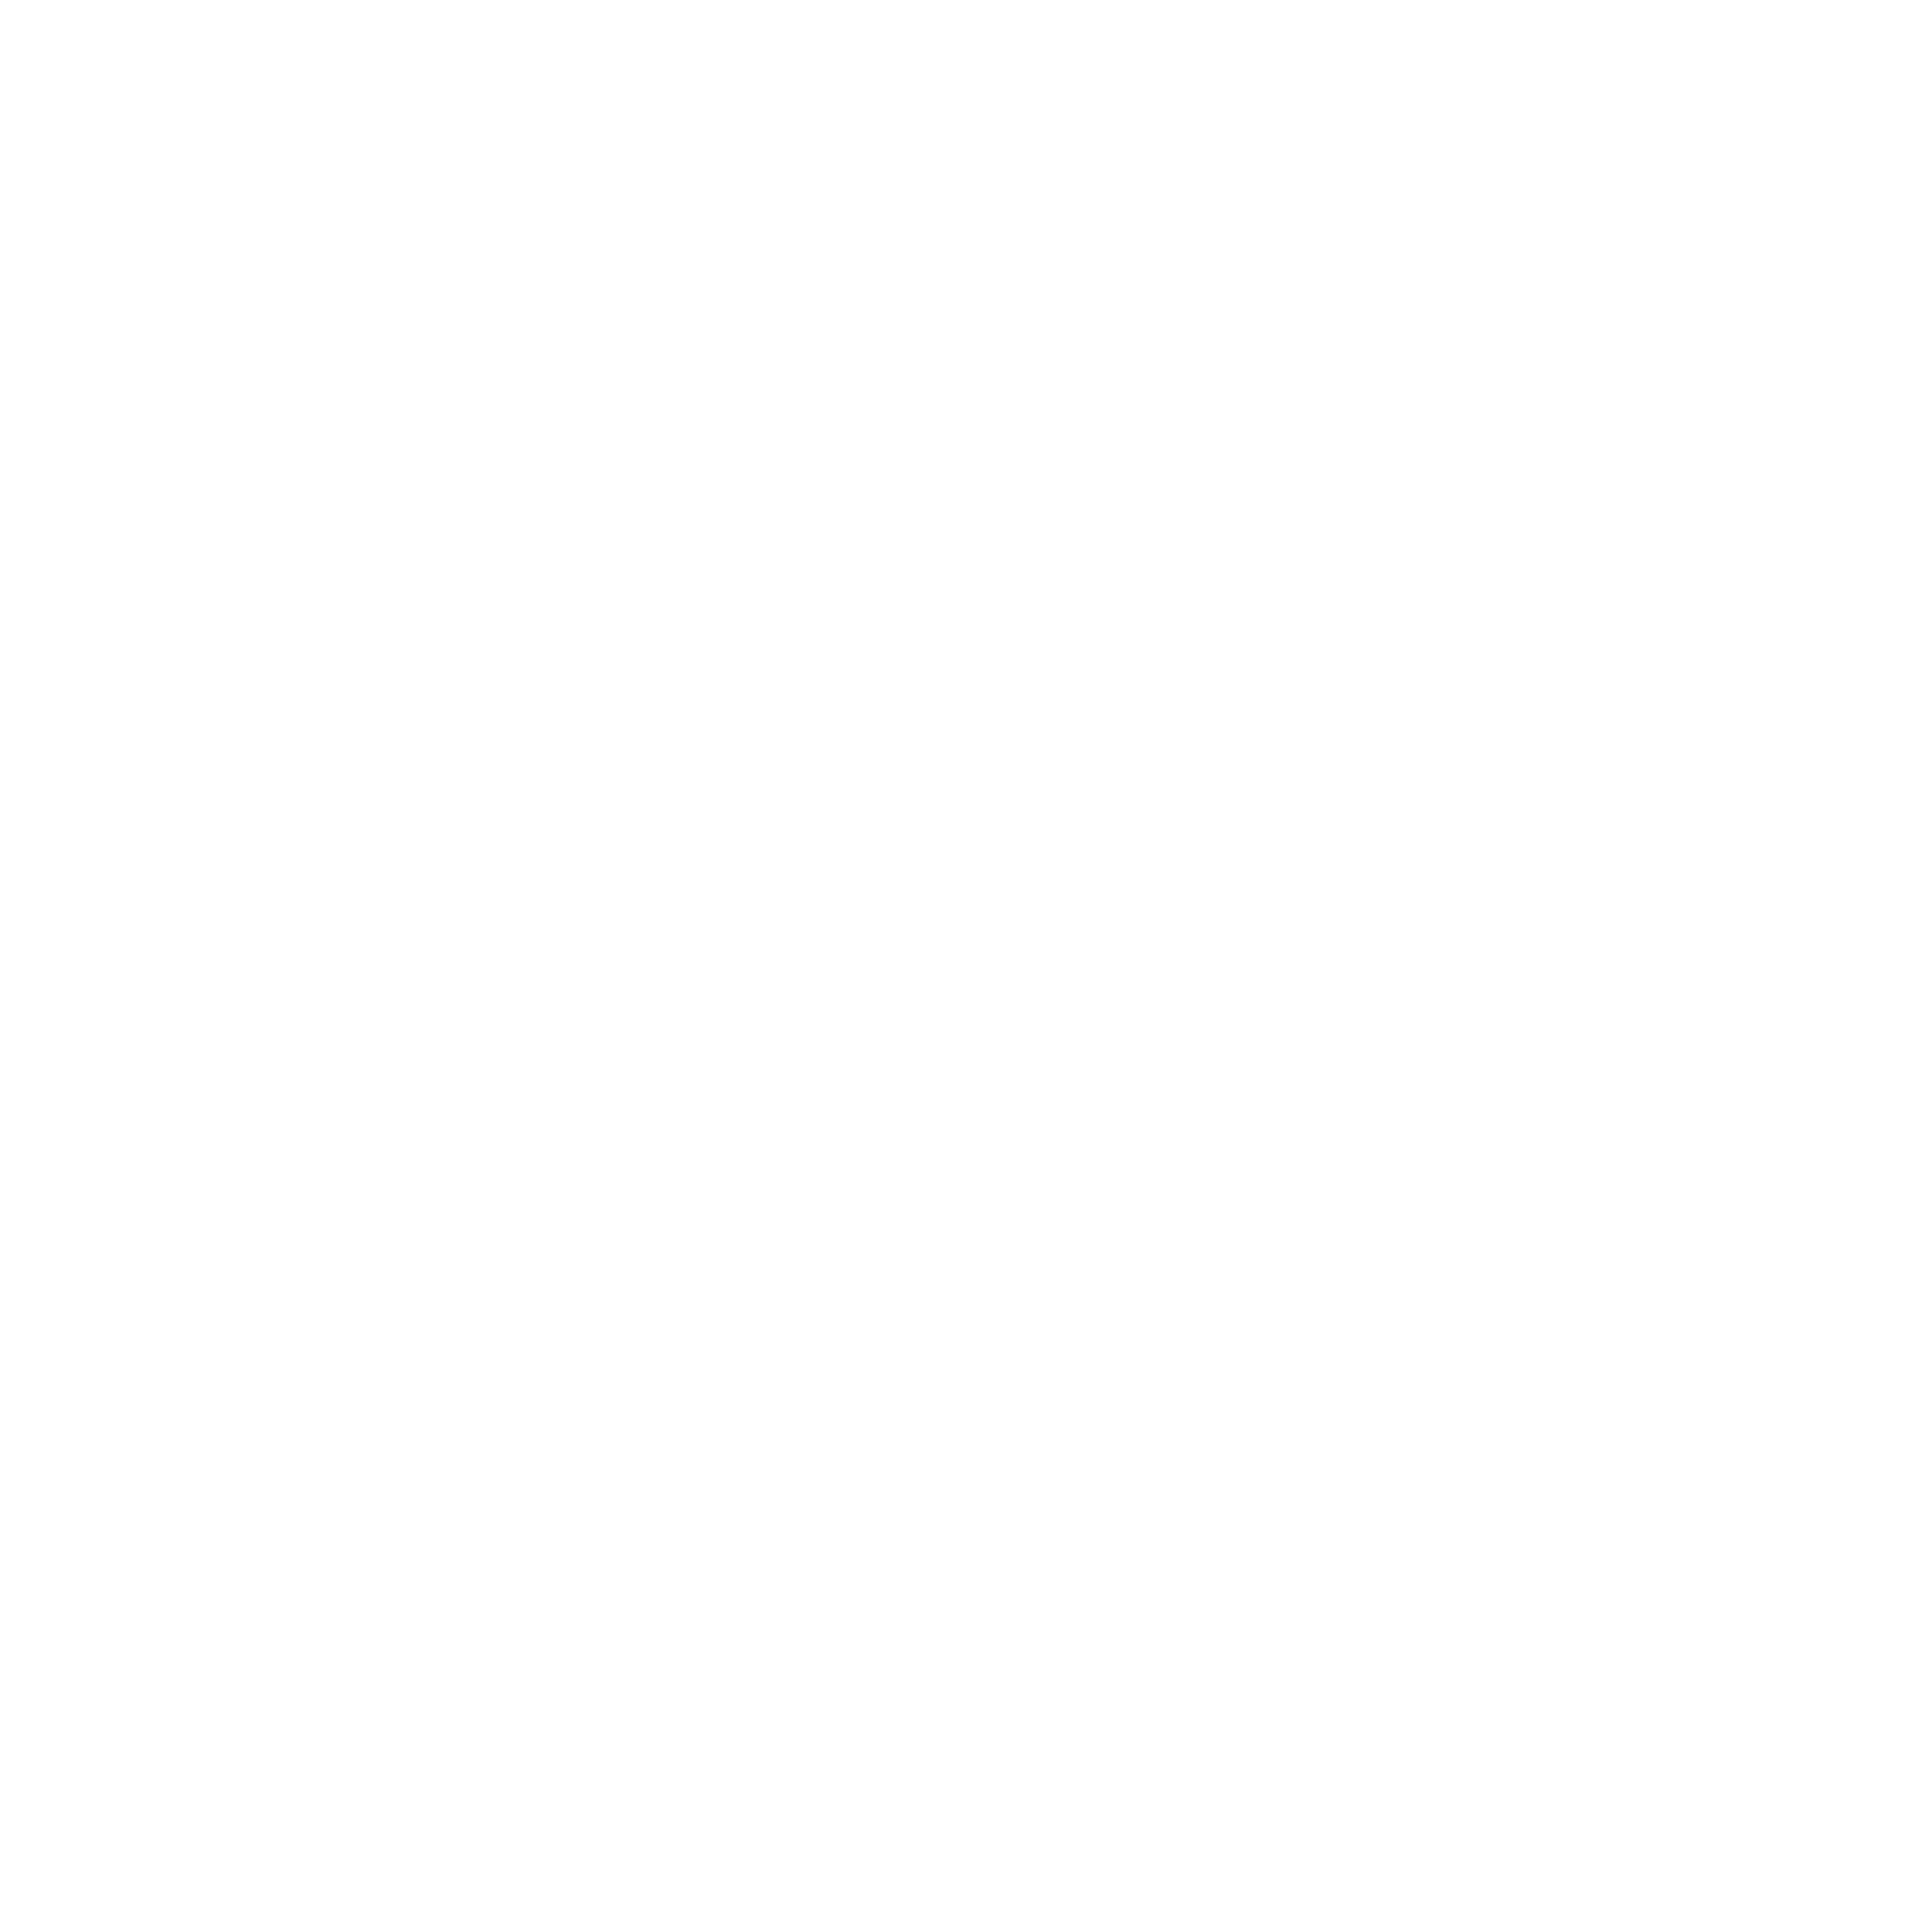 Chaser Integrity Partnership Digital Partner